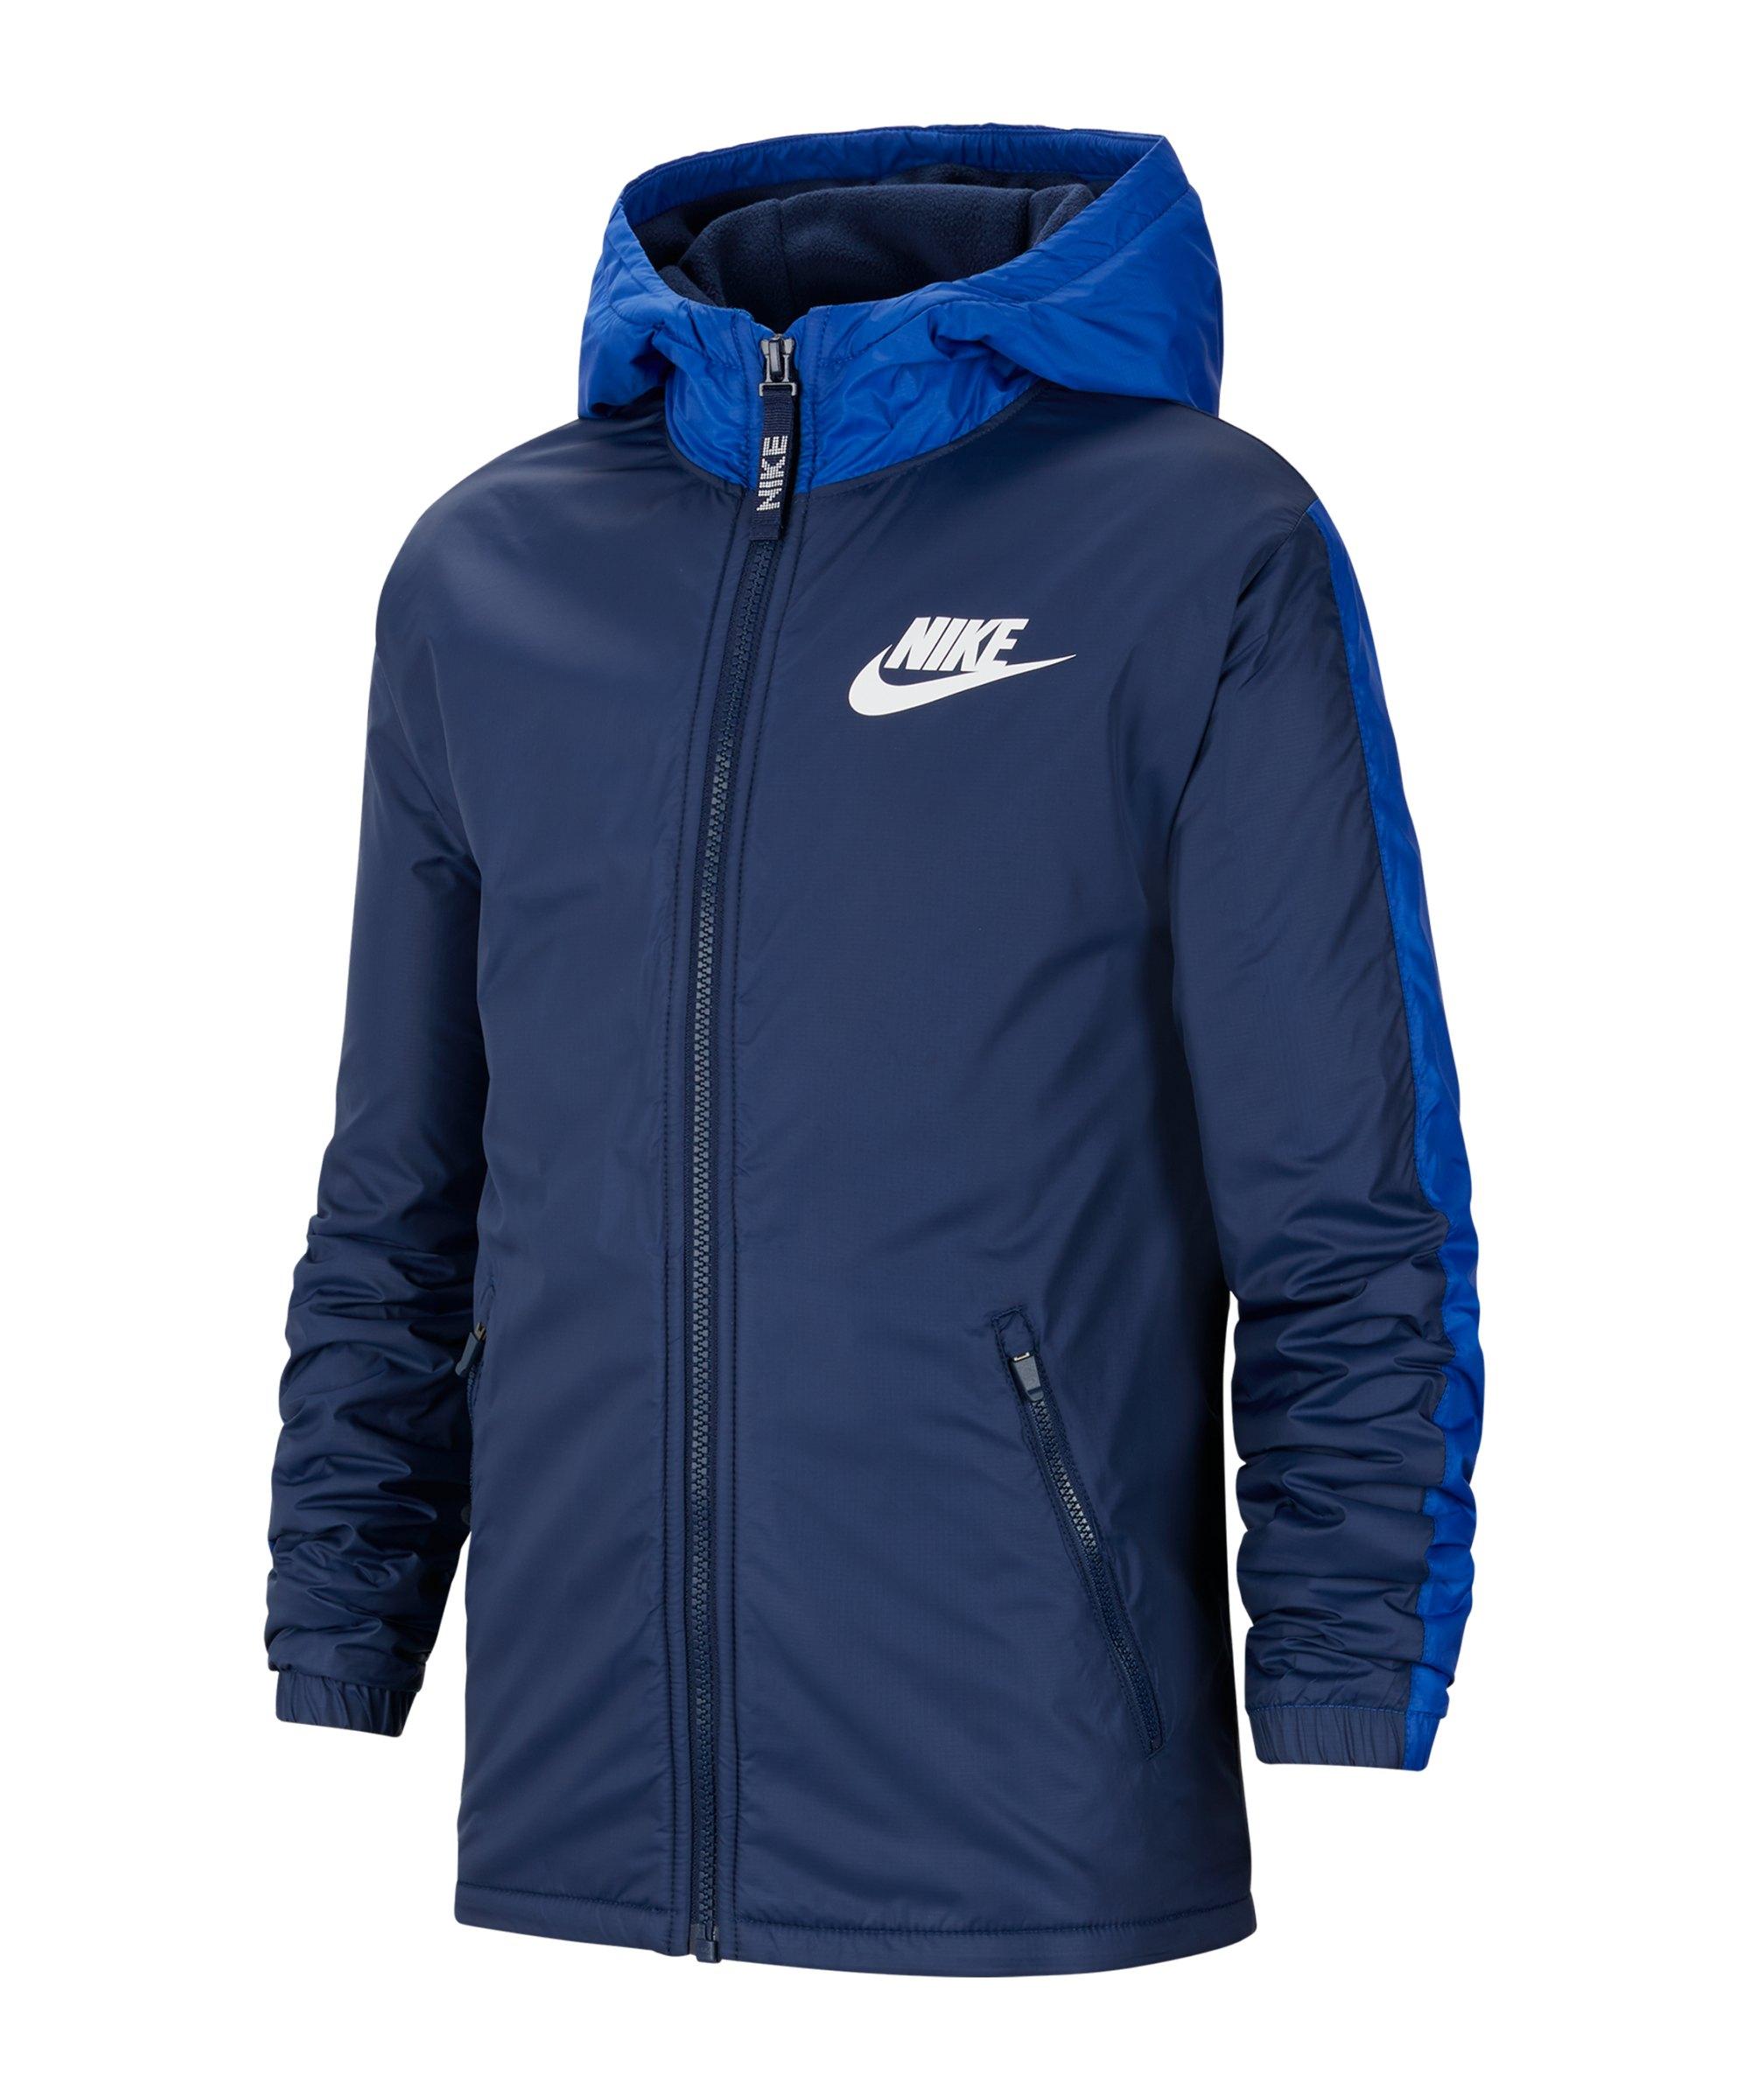 Nike Fleece Lined Jacke Kids Blau F410 - blau